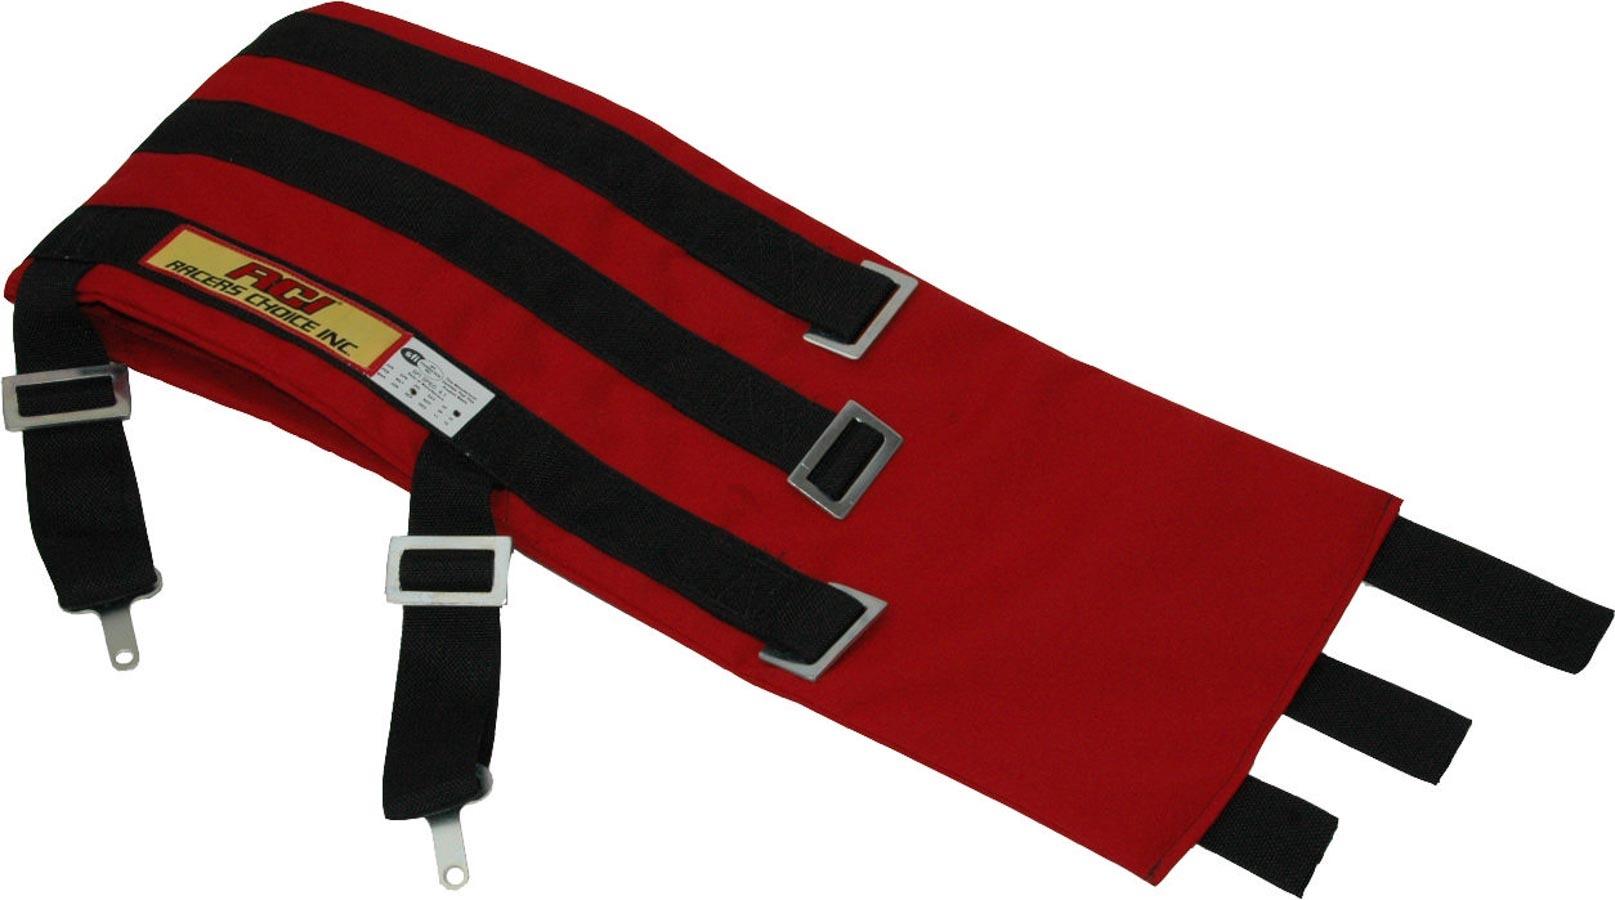 Transmission Blanket Universal SFI 4.1 Red